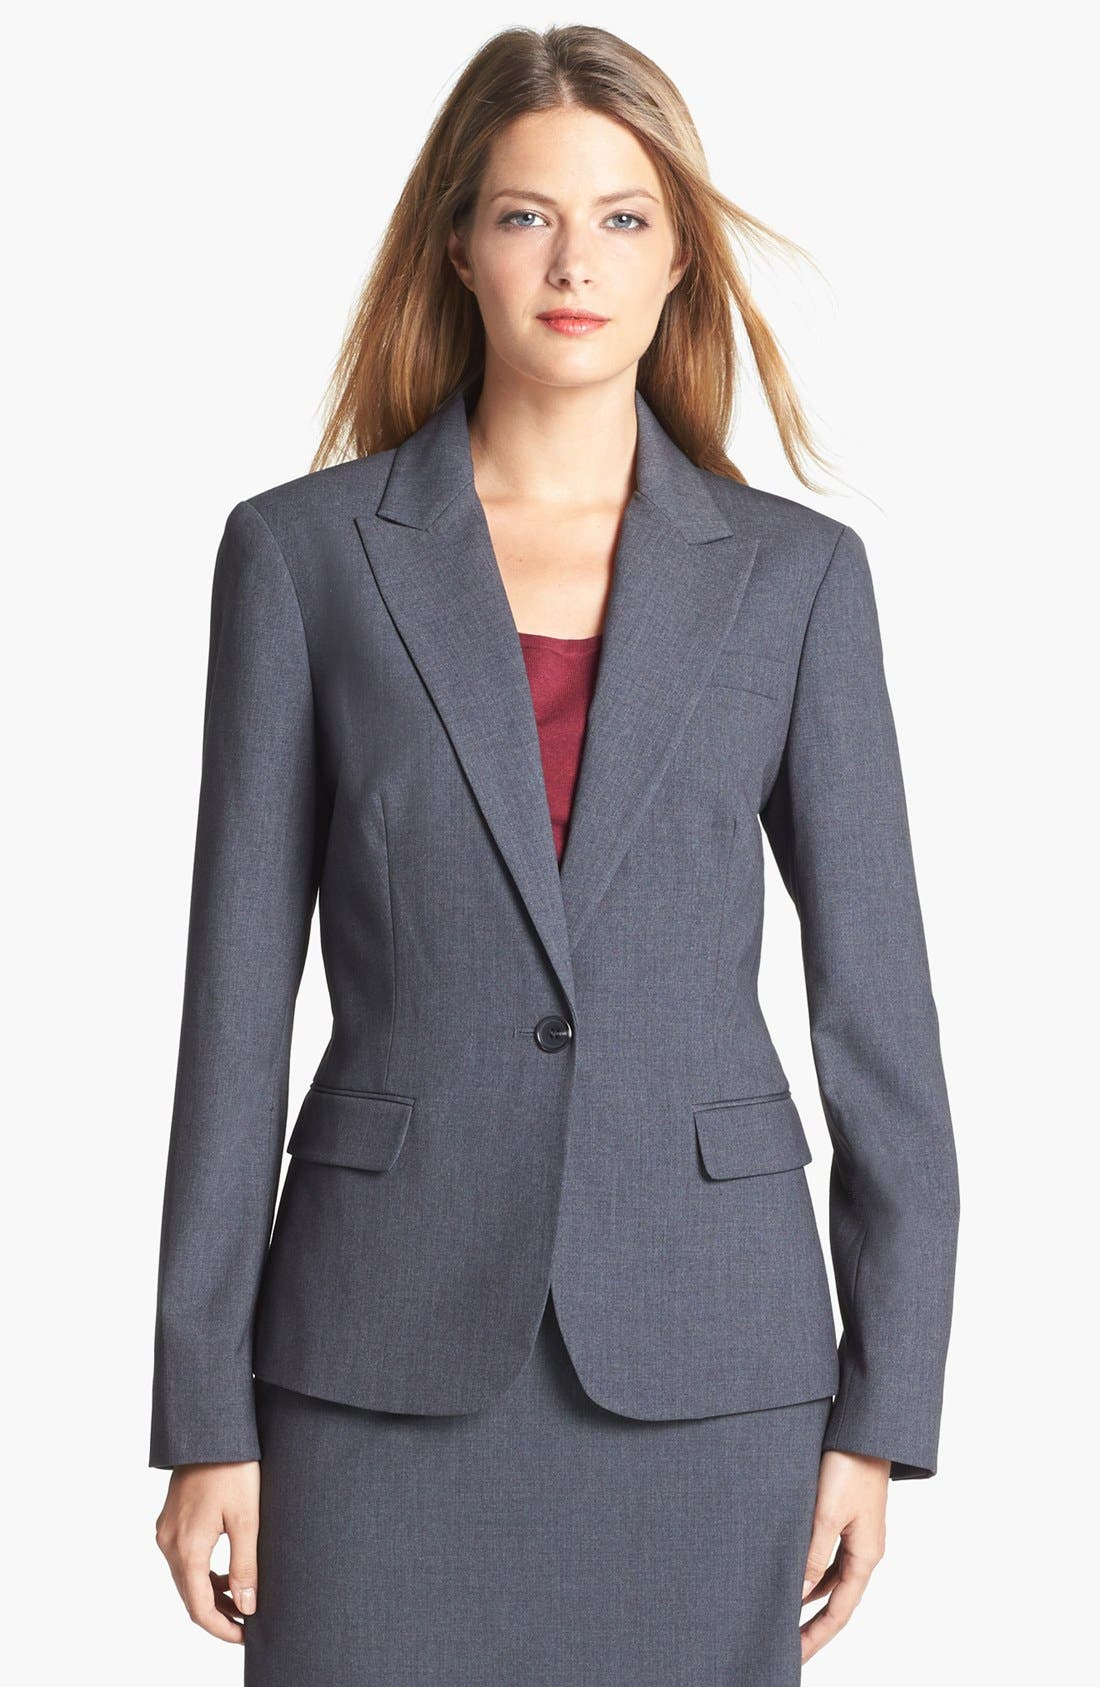 Main Image - Jones New York 'Julia' Single Button Jacket